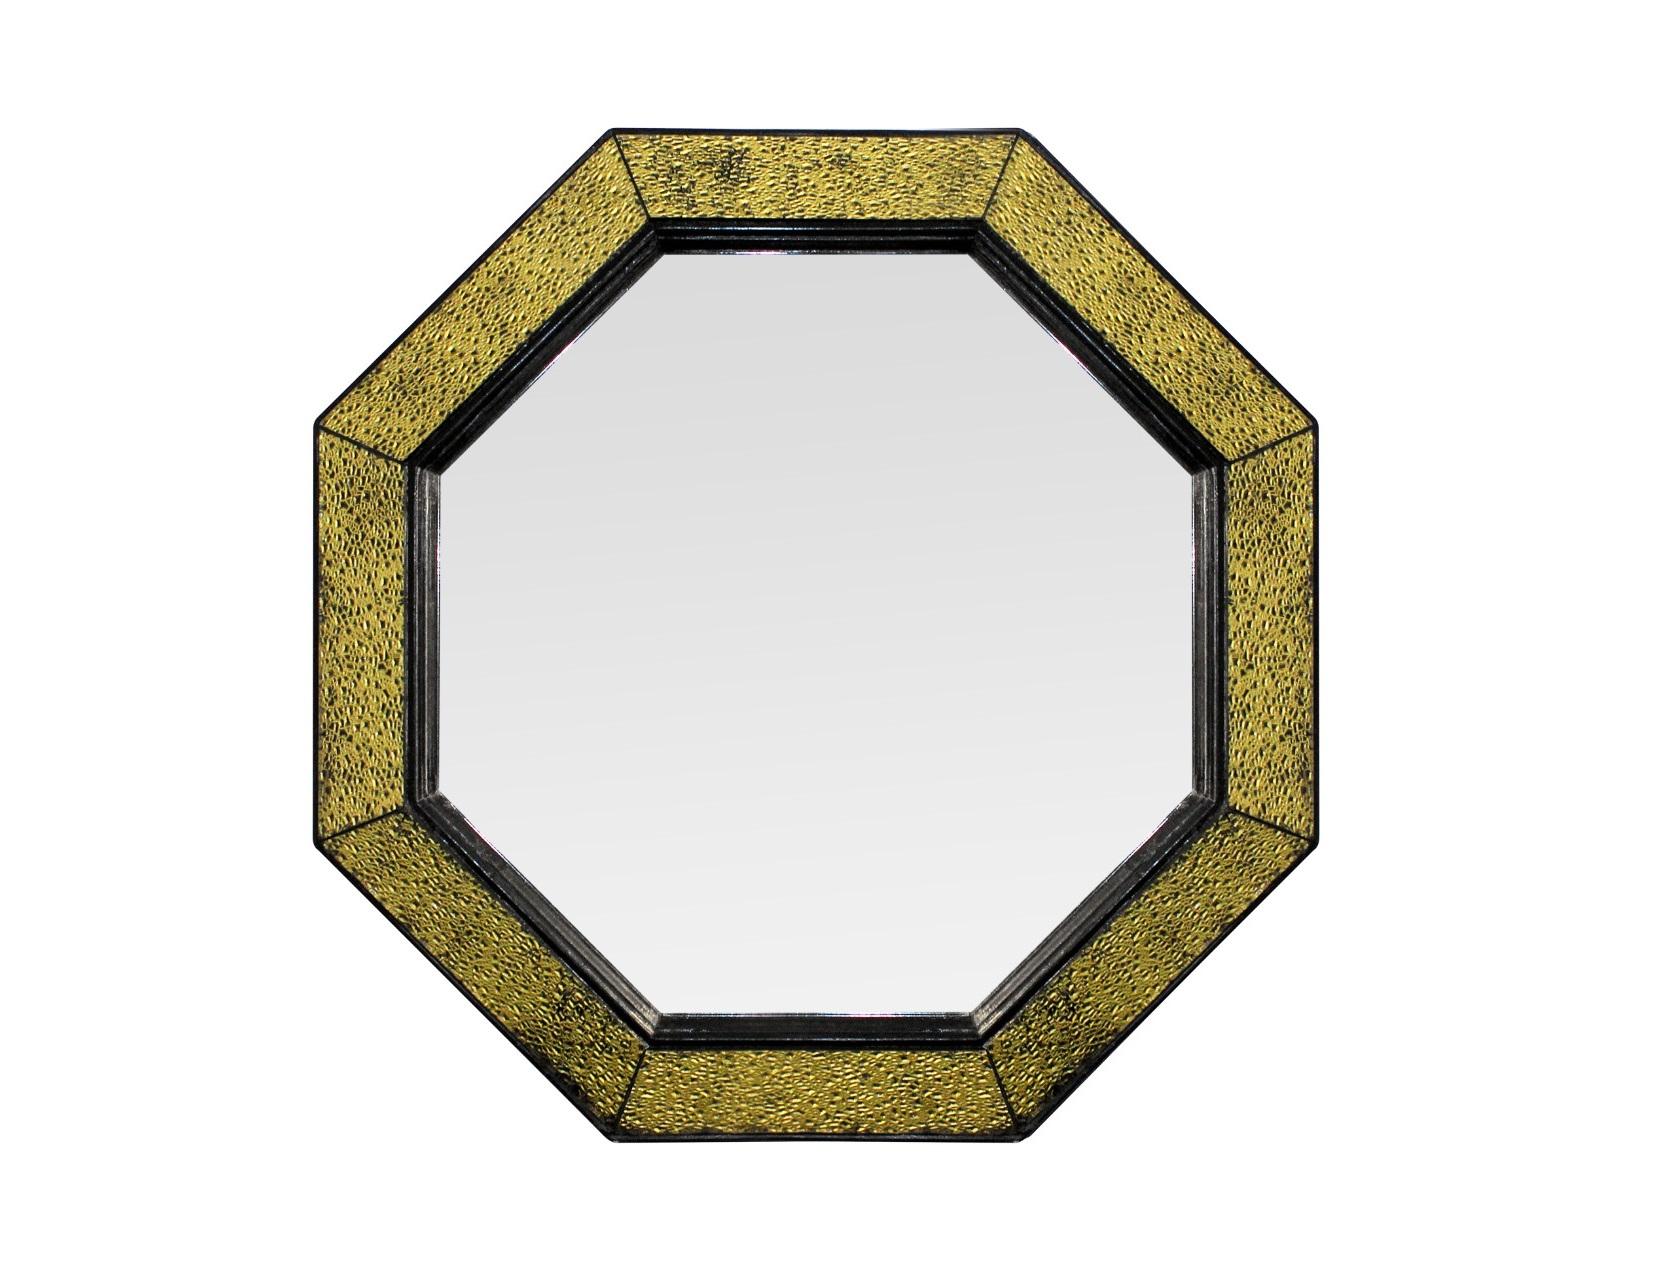 Зеркало maja (bountyhome) золотой 60.0x60.0x5.0 см. фото